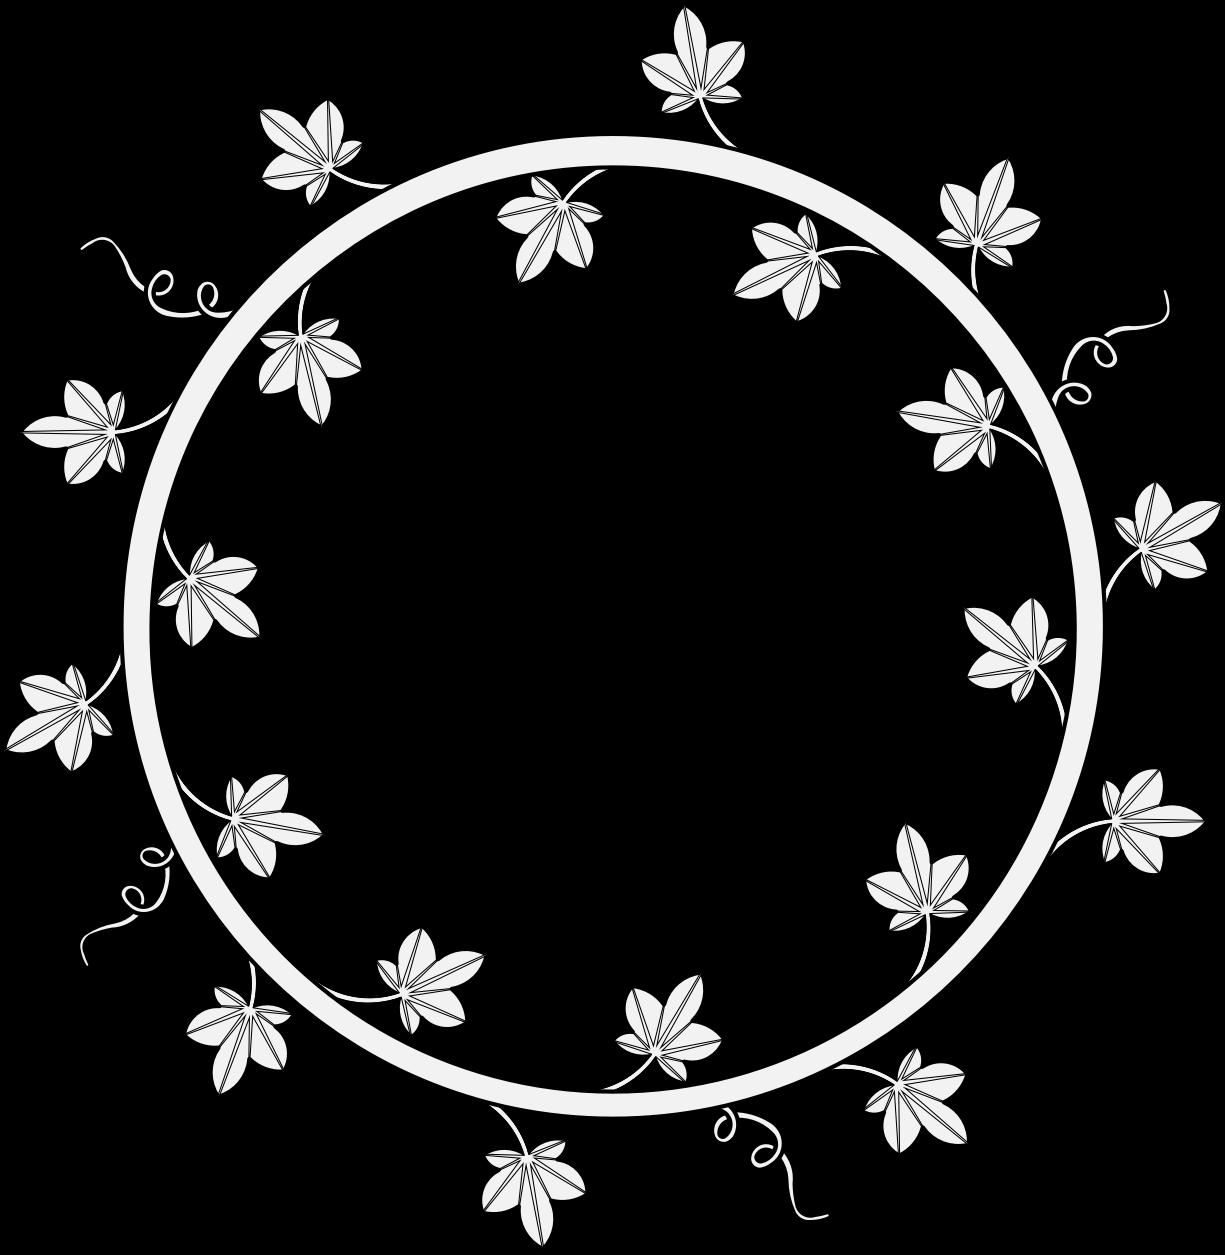 Ivy clipart design. Heraldry leaf clip art